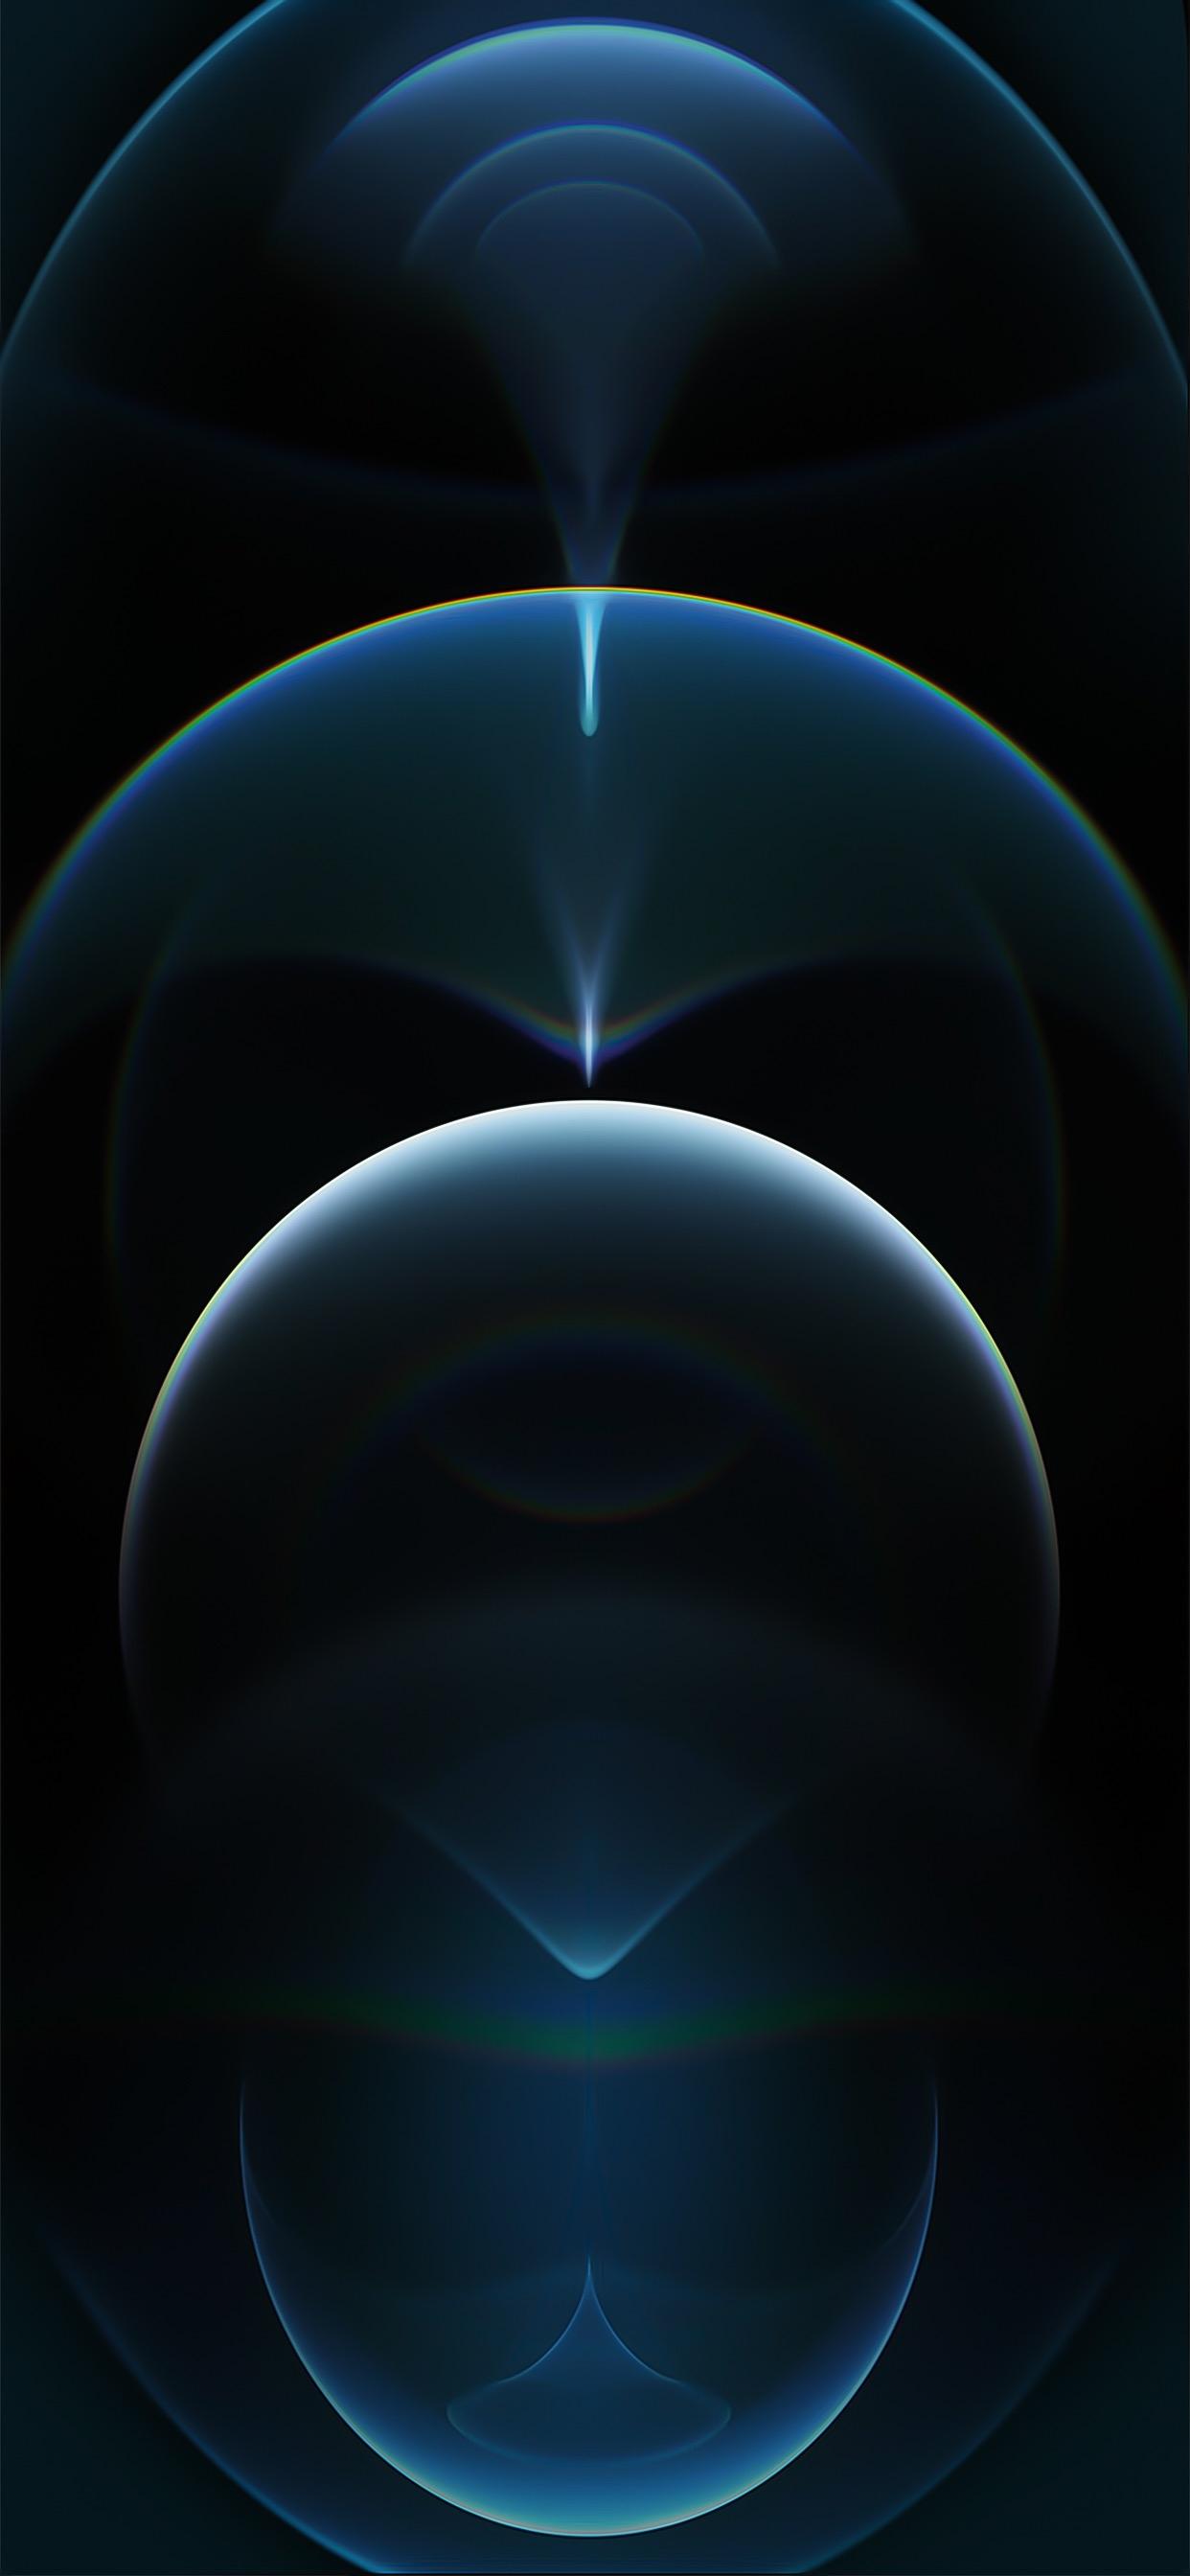 iphone 12 pro mavi